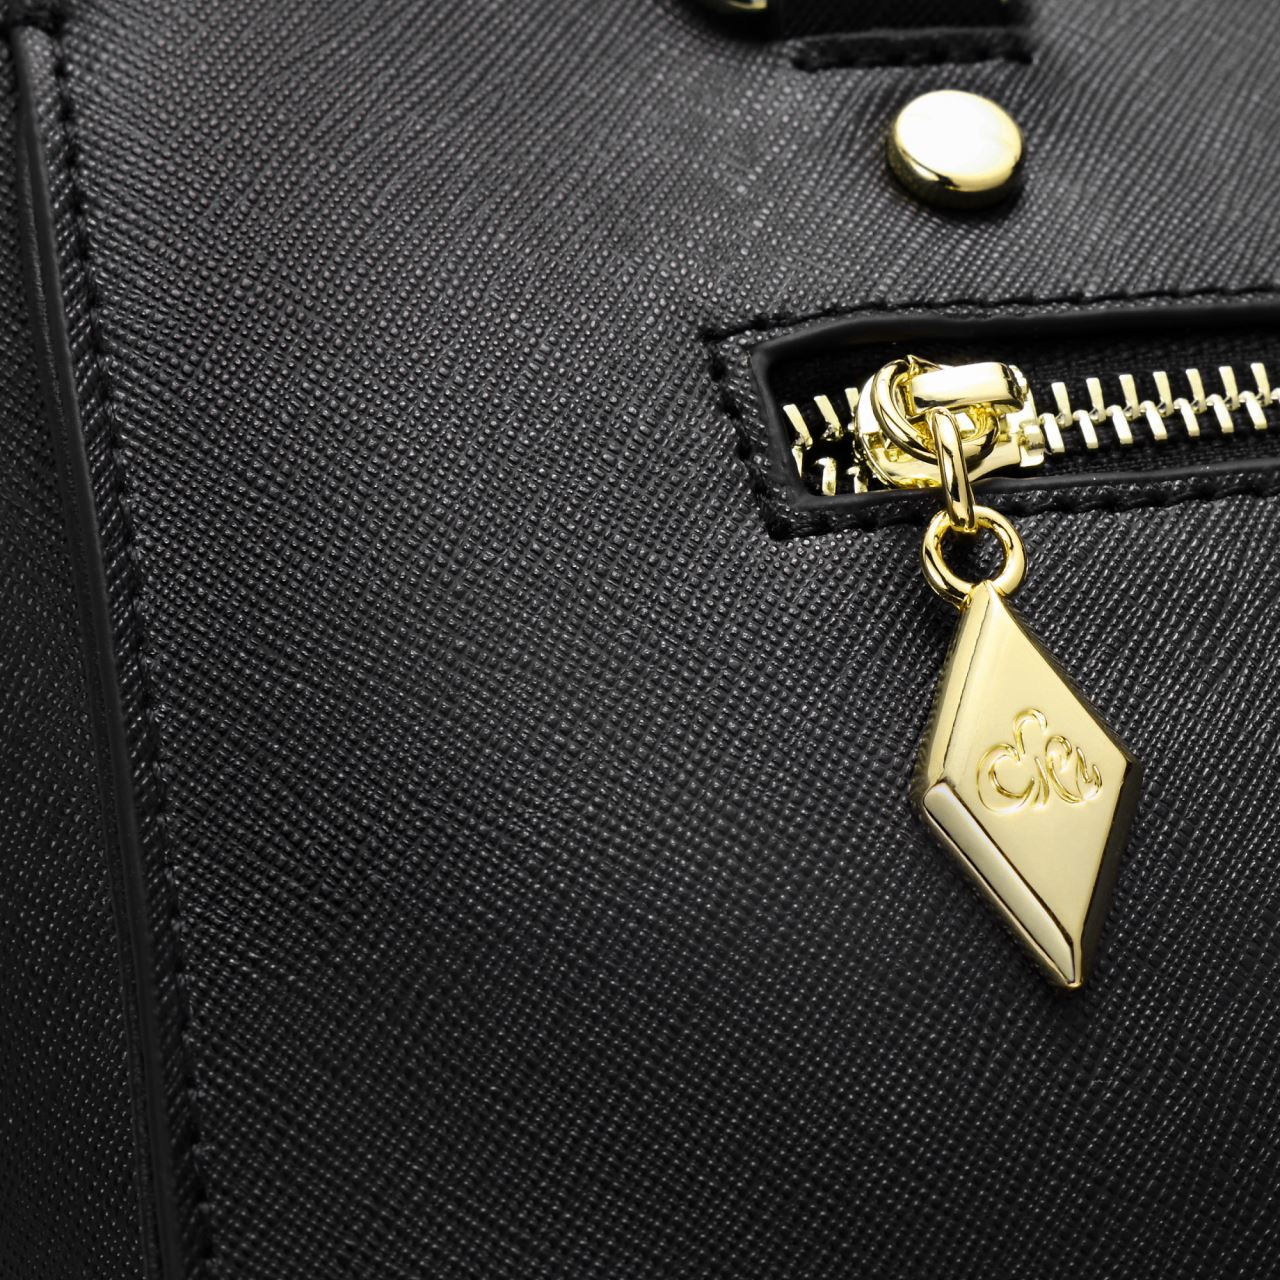 d7c724b30ecc9 C iel Aniyah negru geanta tote din piele saffiano - Ciel Bags